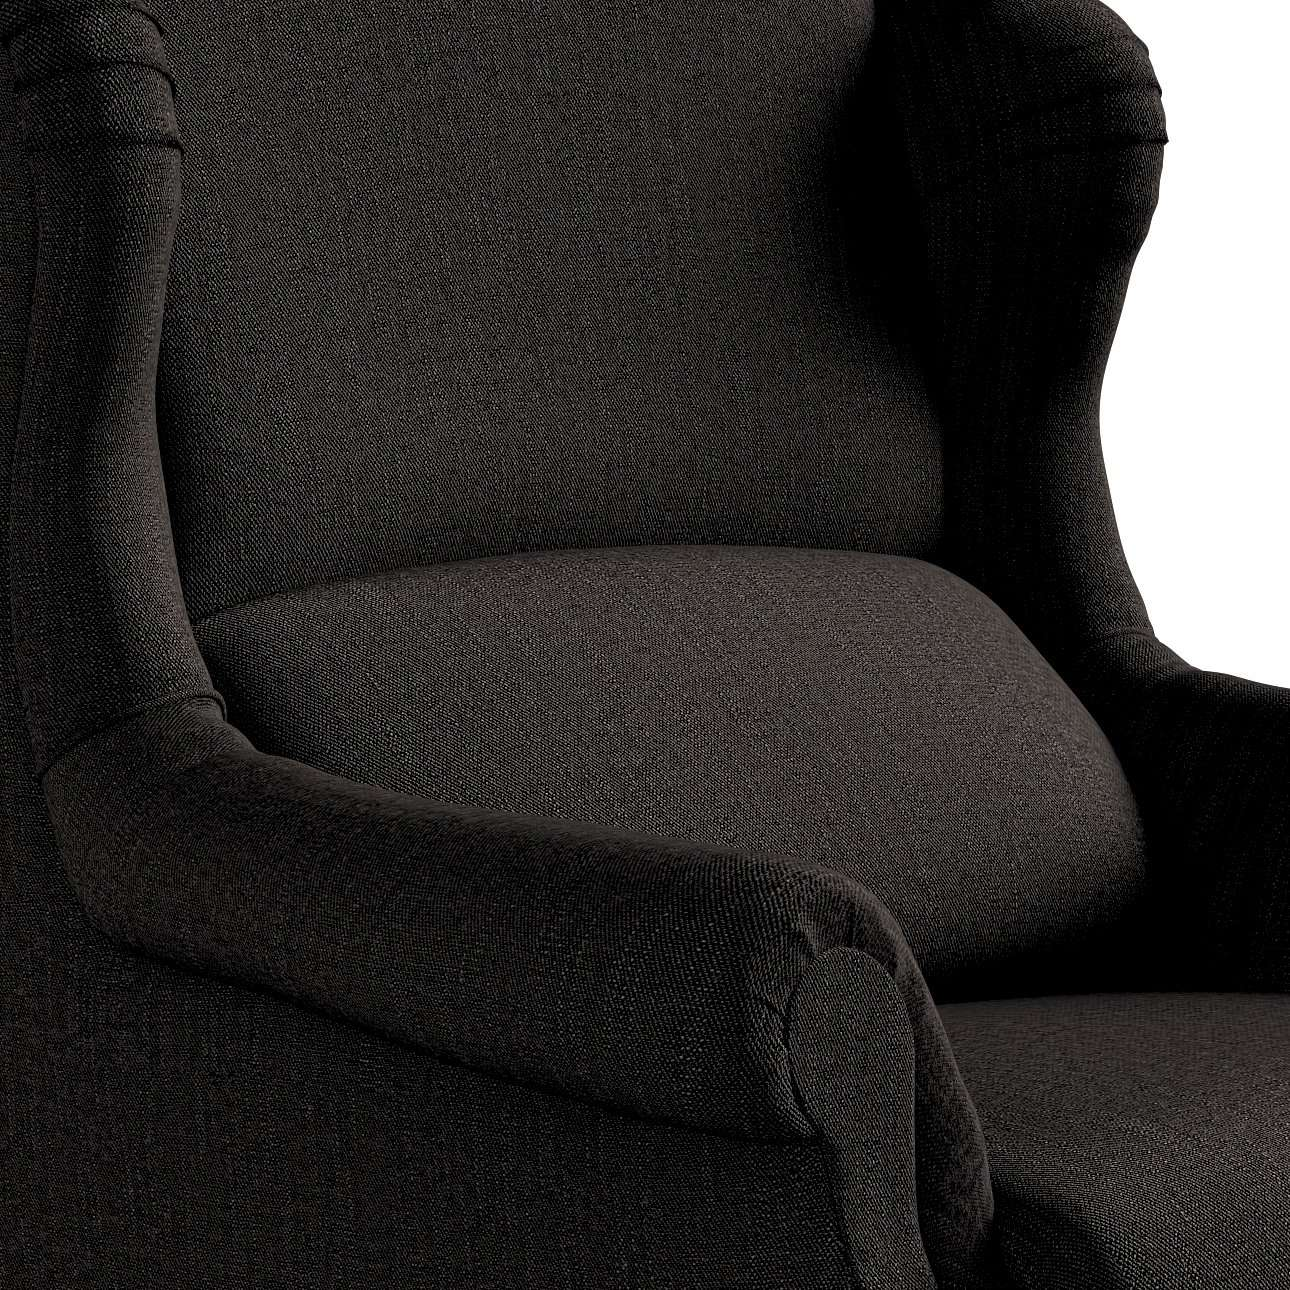 Fotel Unique w kolekcji Vintage, tkanina: 702-36